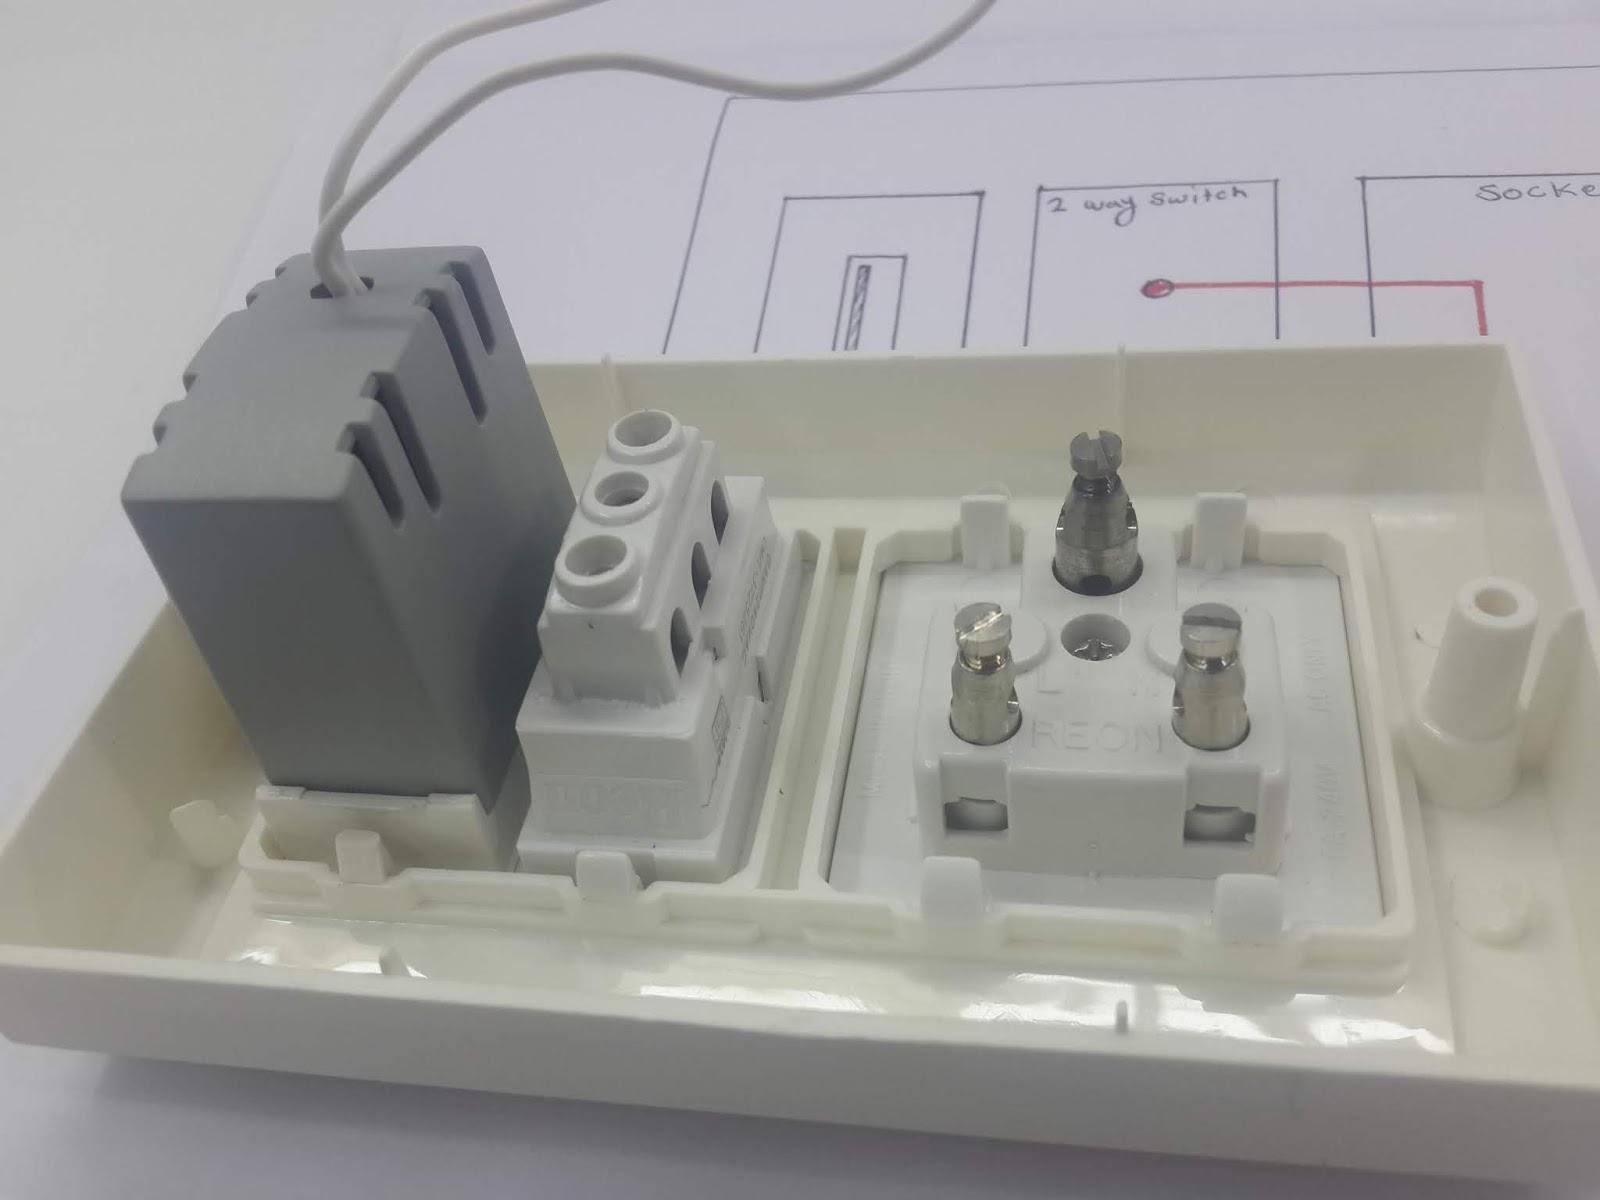 Deepakkumar Yadav Usb Socket Wiring Connection On